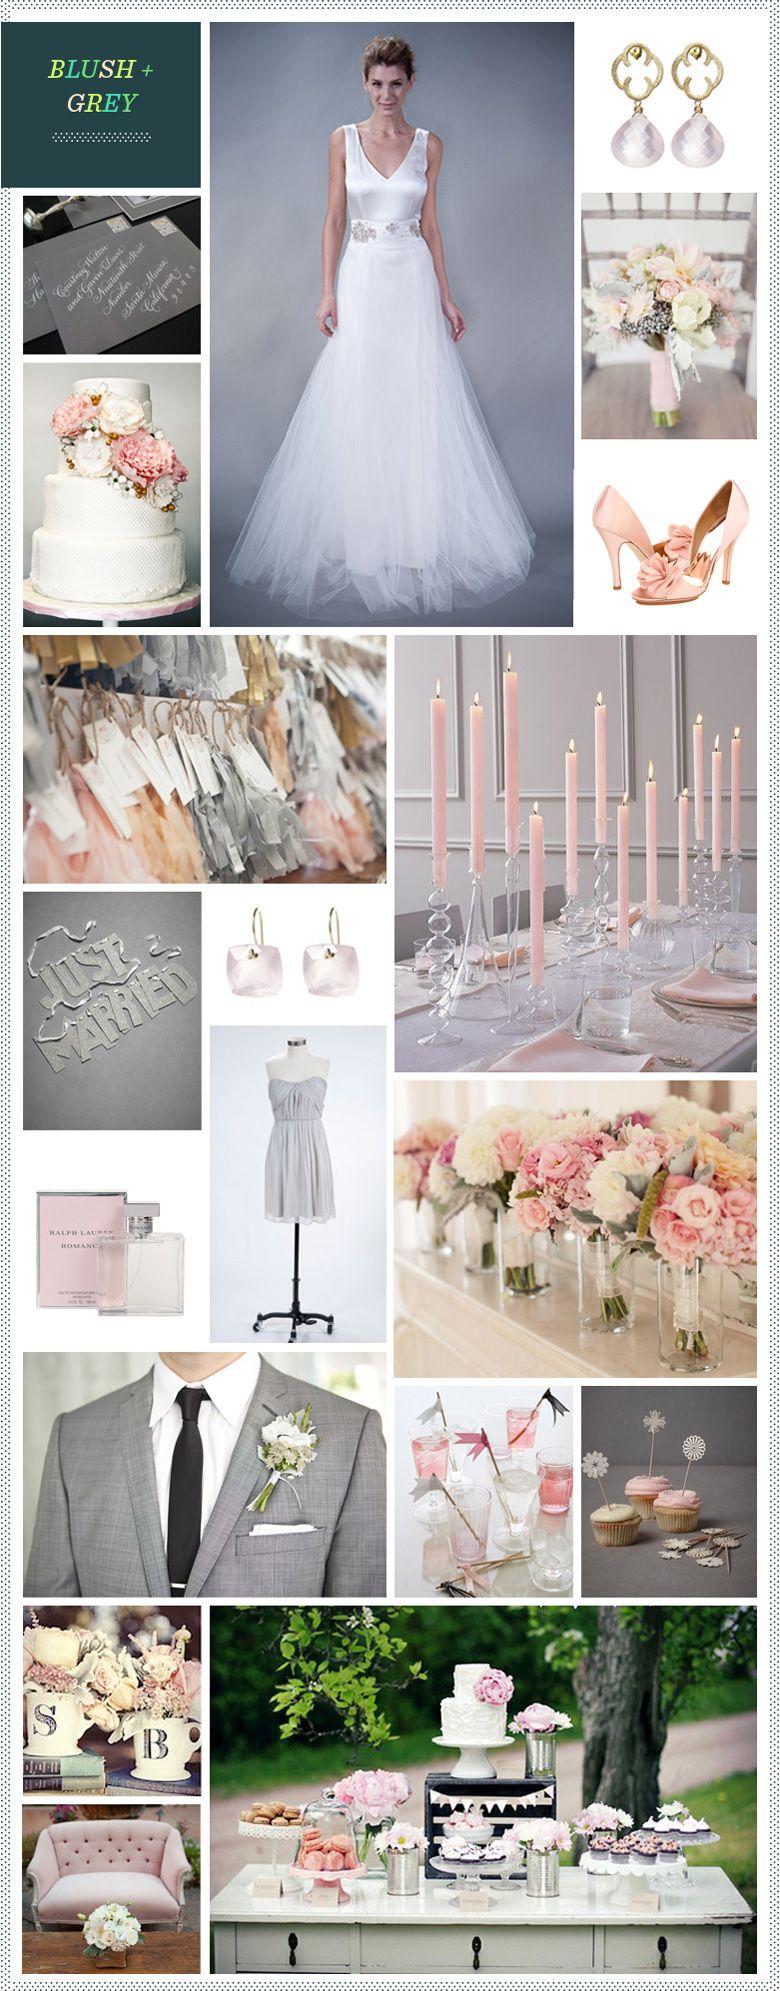 Blush + Grey wedding inspiration | I thee wed | Pinterest | Grey ...